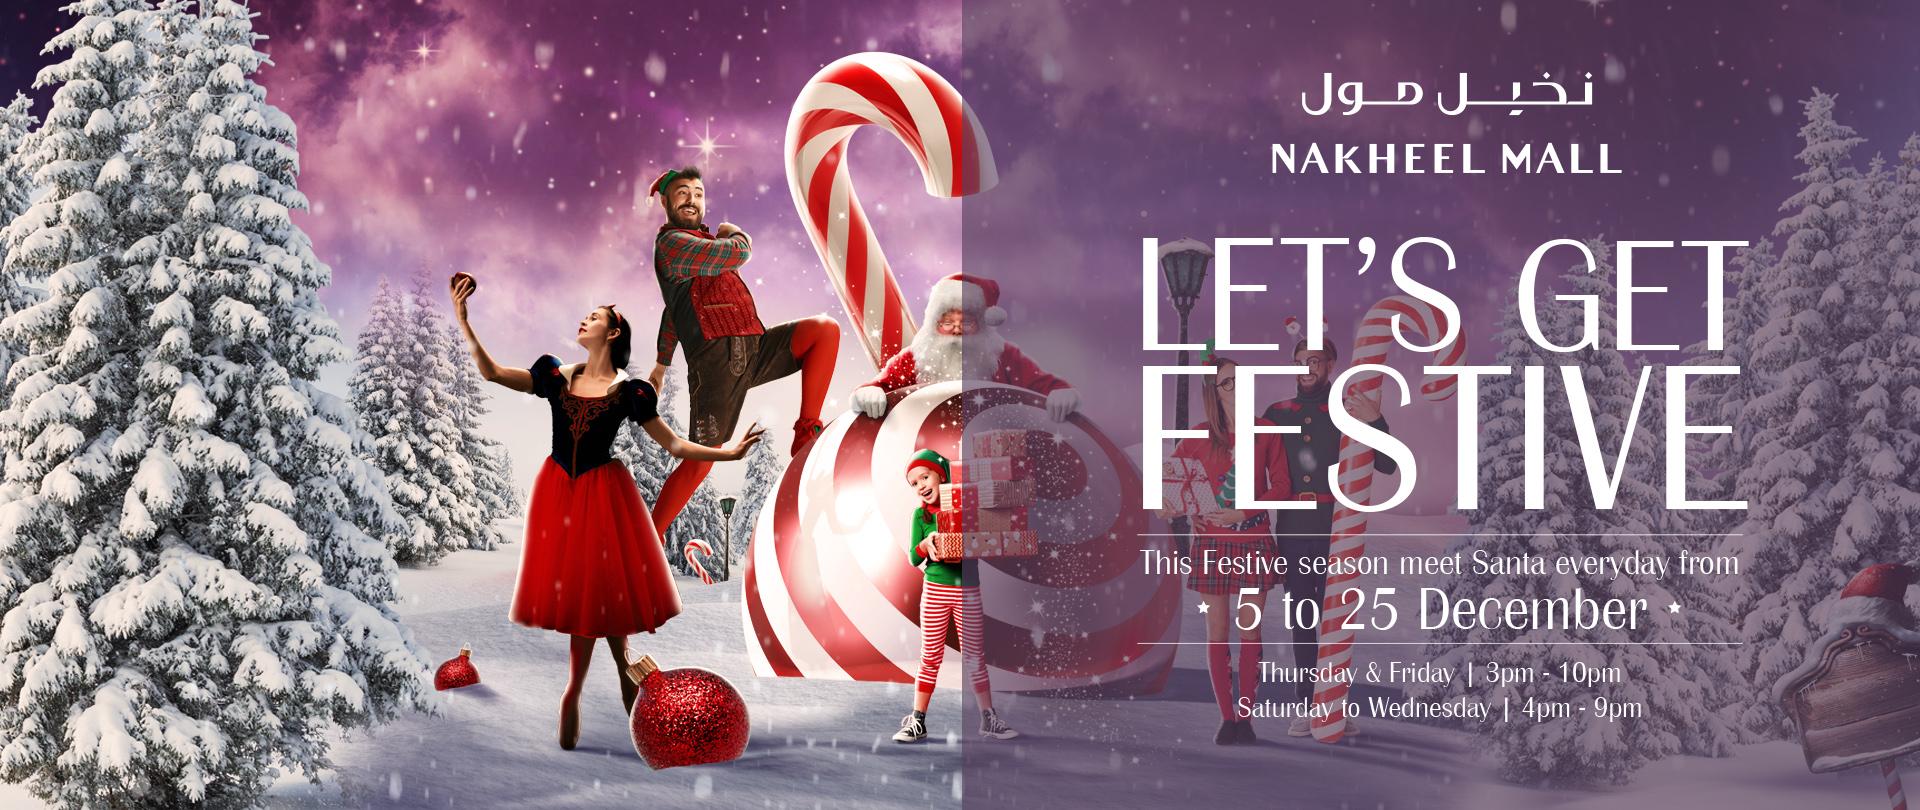 Step into a winter wonderland this festive season at Nakheel Mall